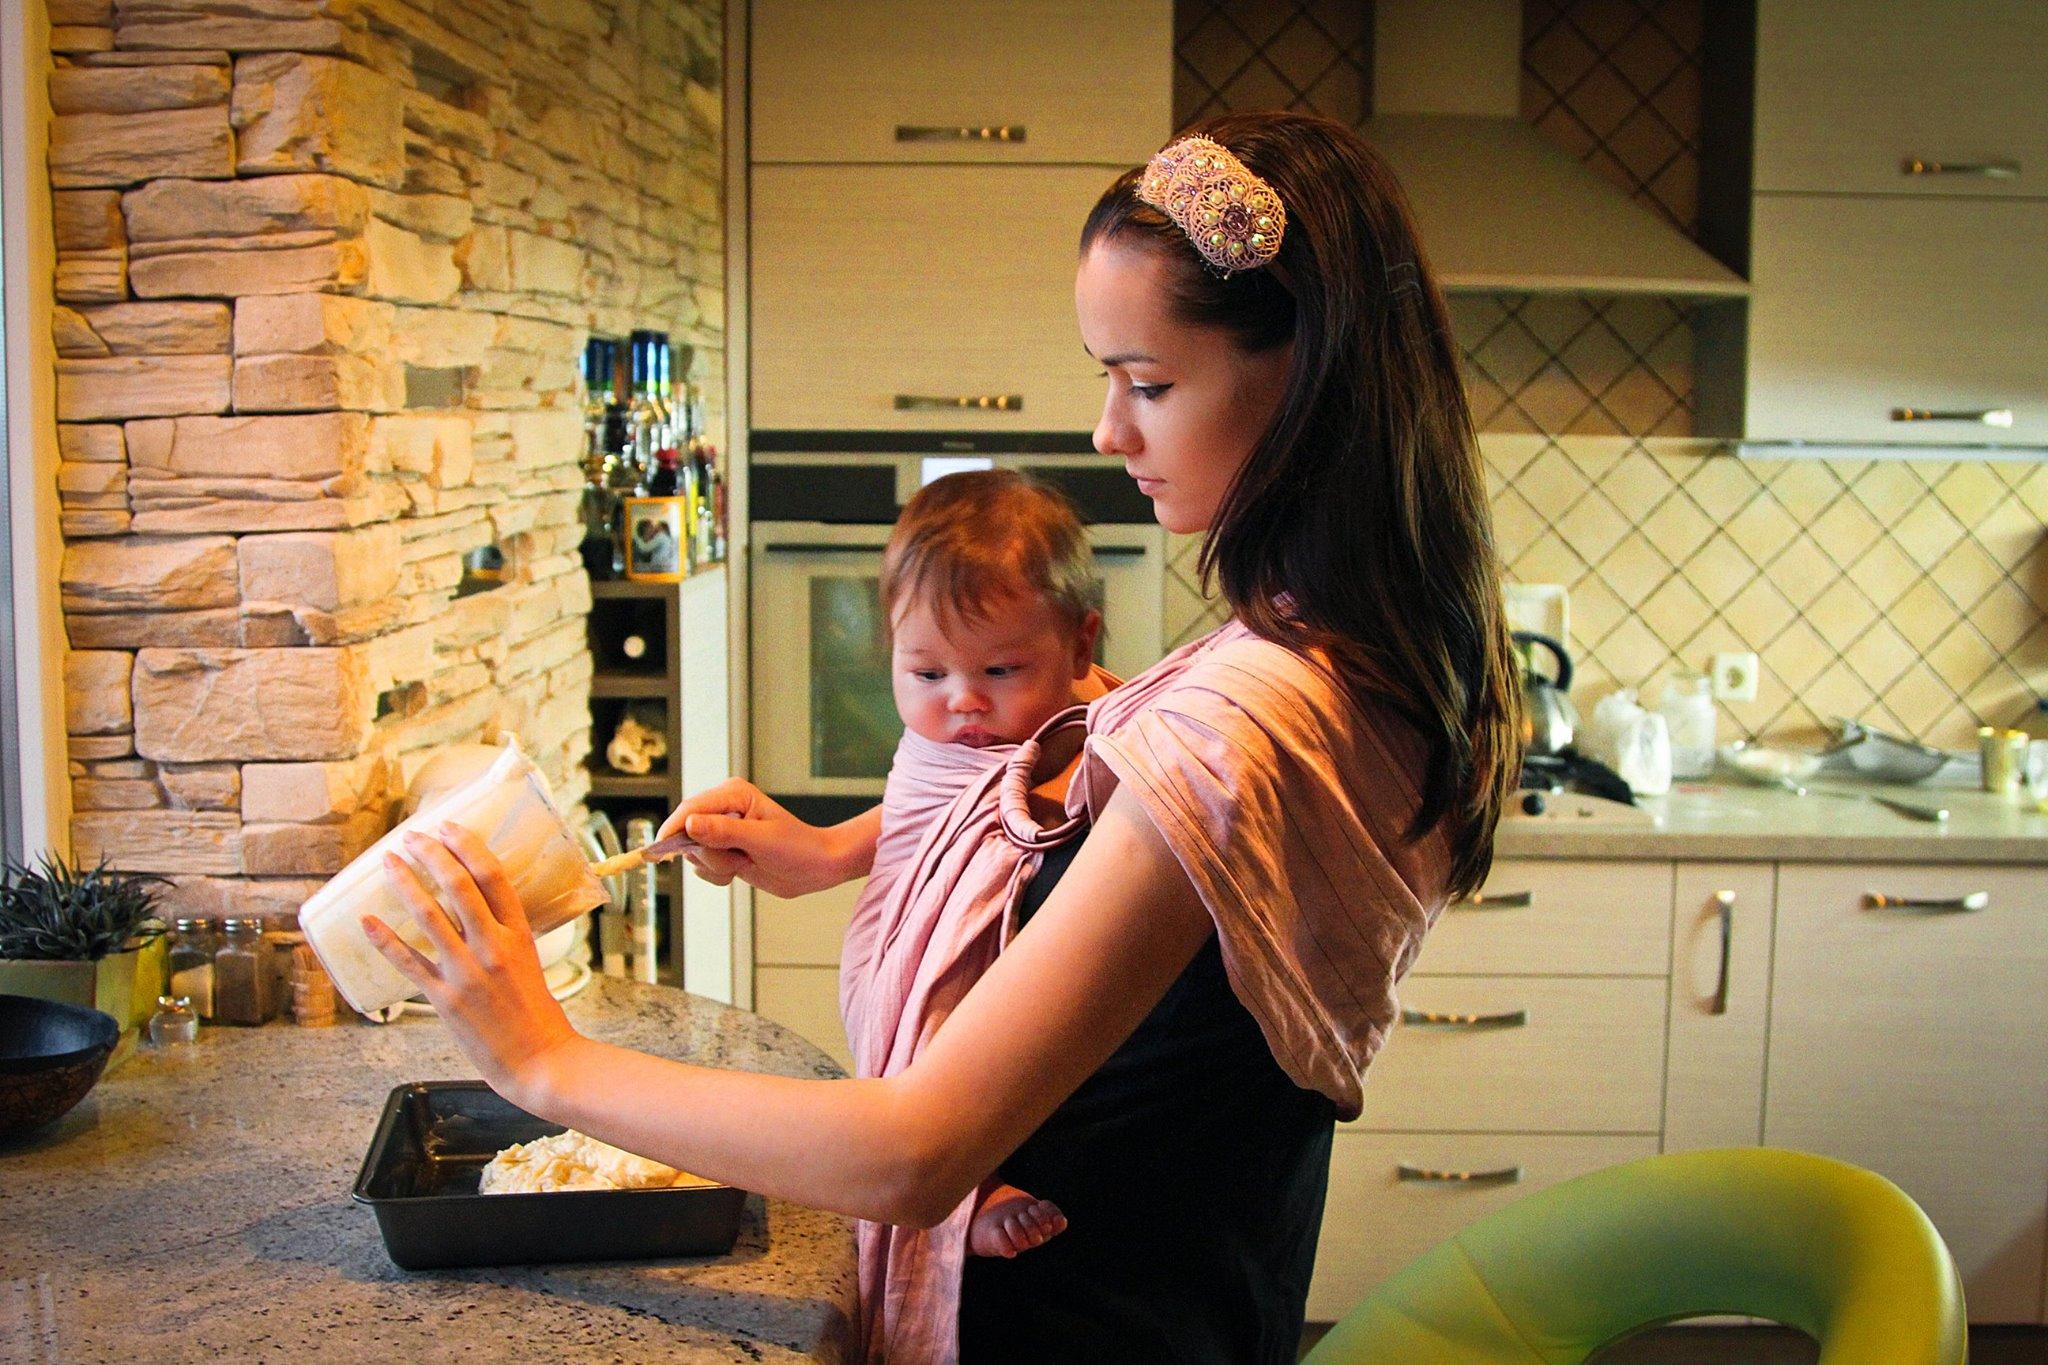 мама в слинге готовит, мама на кухне